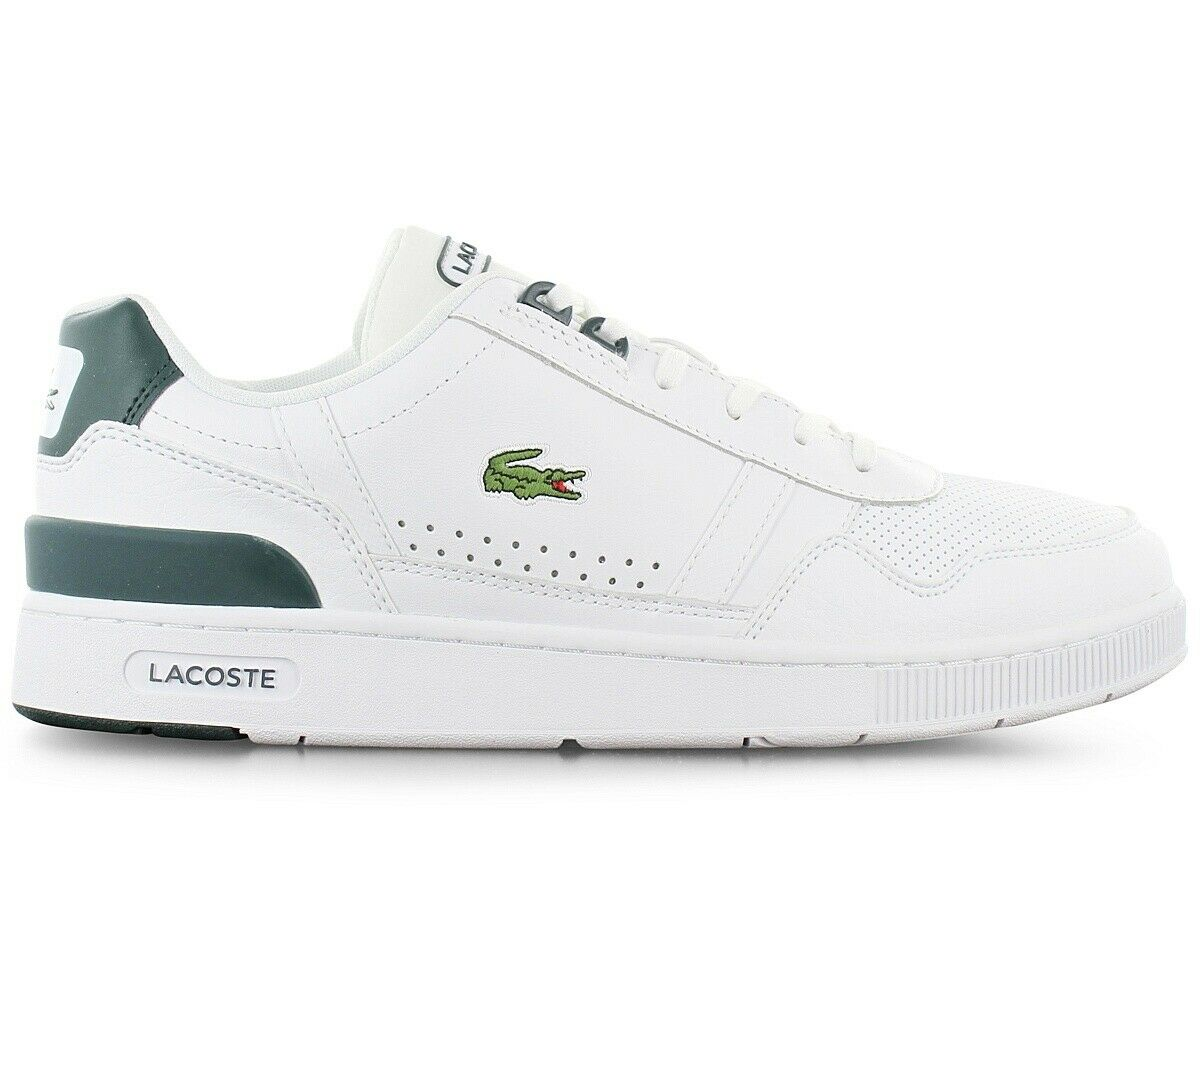 Lacoste T-Clip 120 Men's Sneaker White 7-40SMA00501R5 Leisure Casual Shoes New